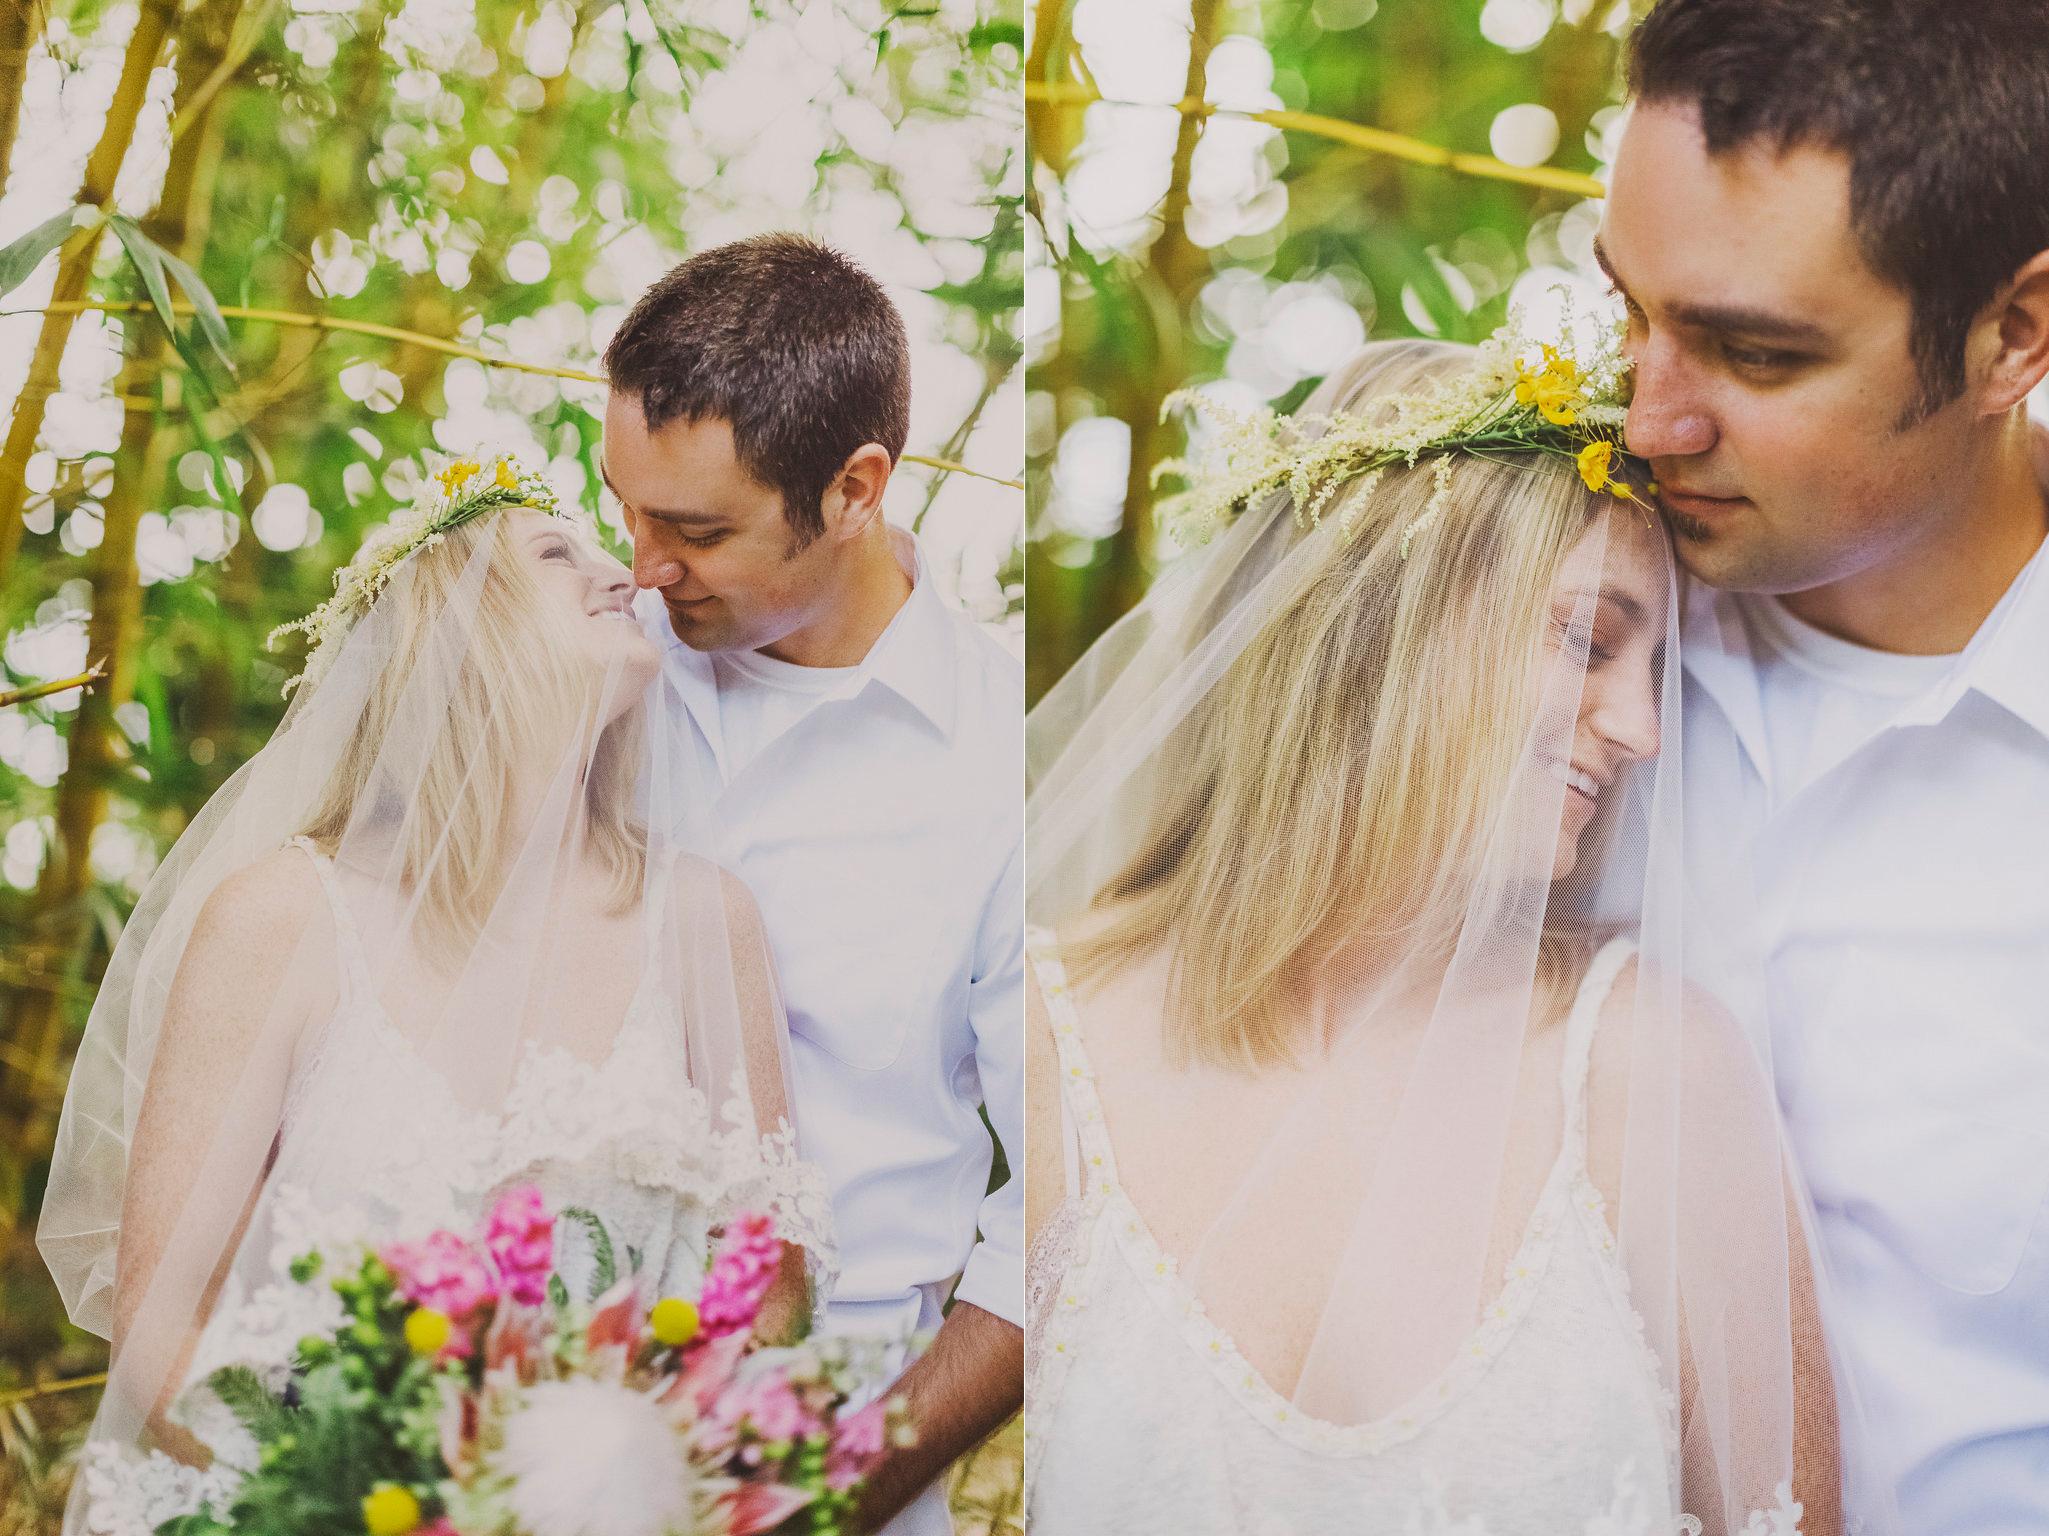 angie-diaz-photography-crisna-brandon-day-after-wedding-6.jpg